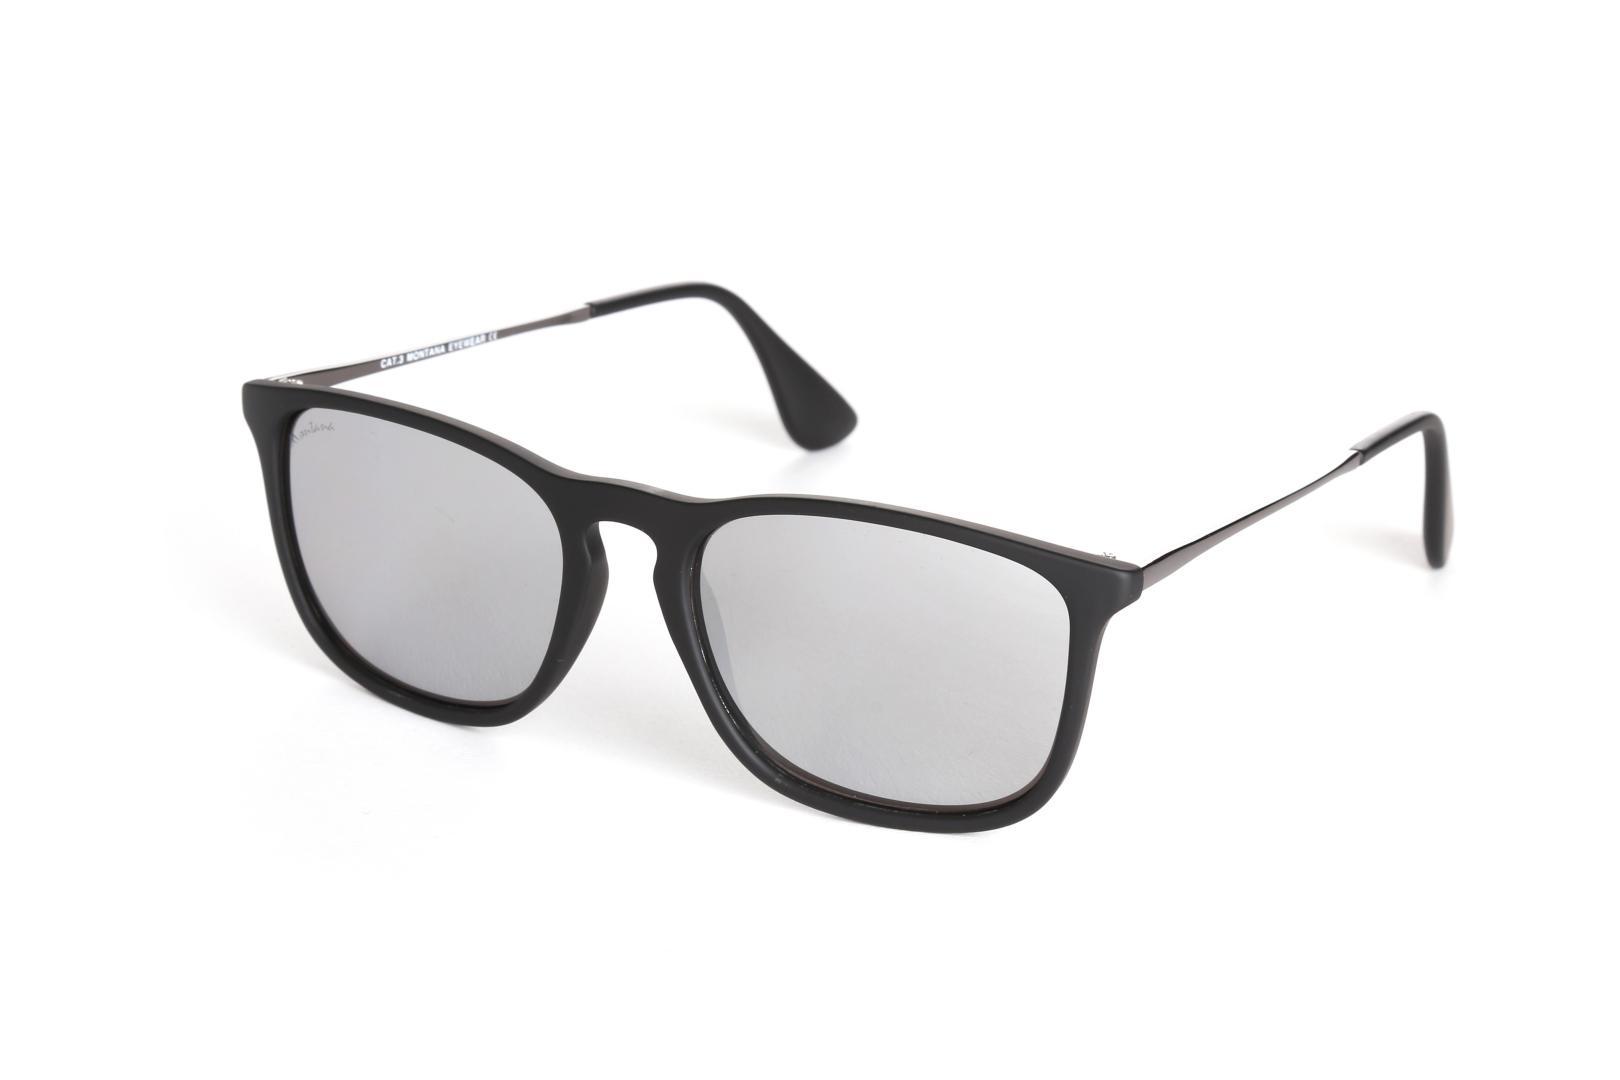 Montana Eyewear MS34-Schwarz flDKXo1sT